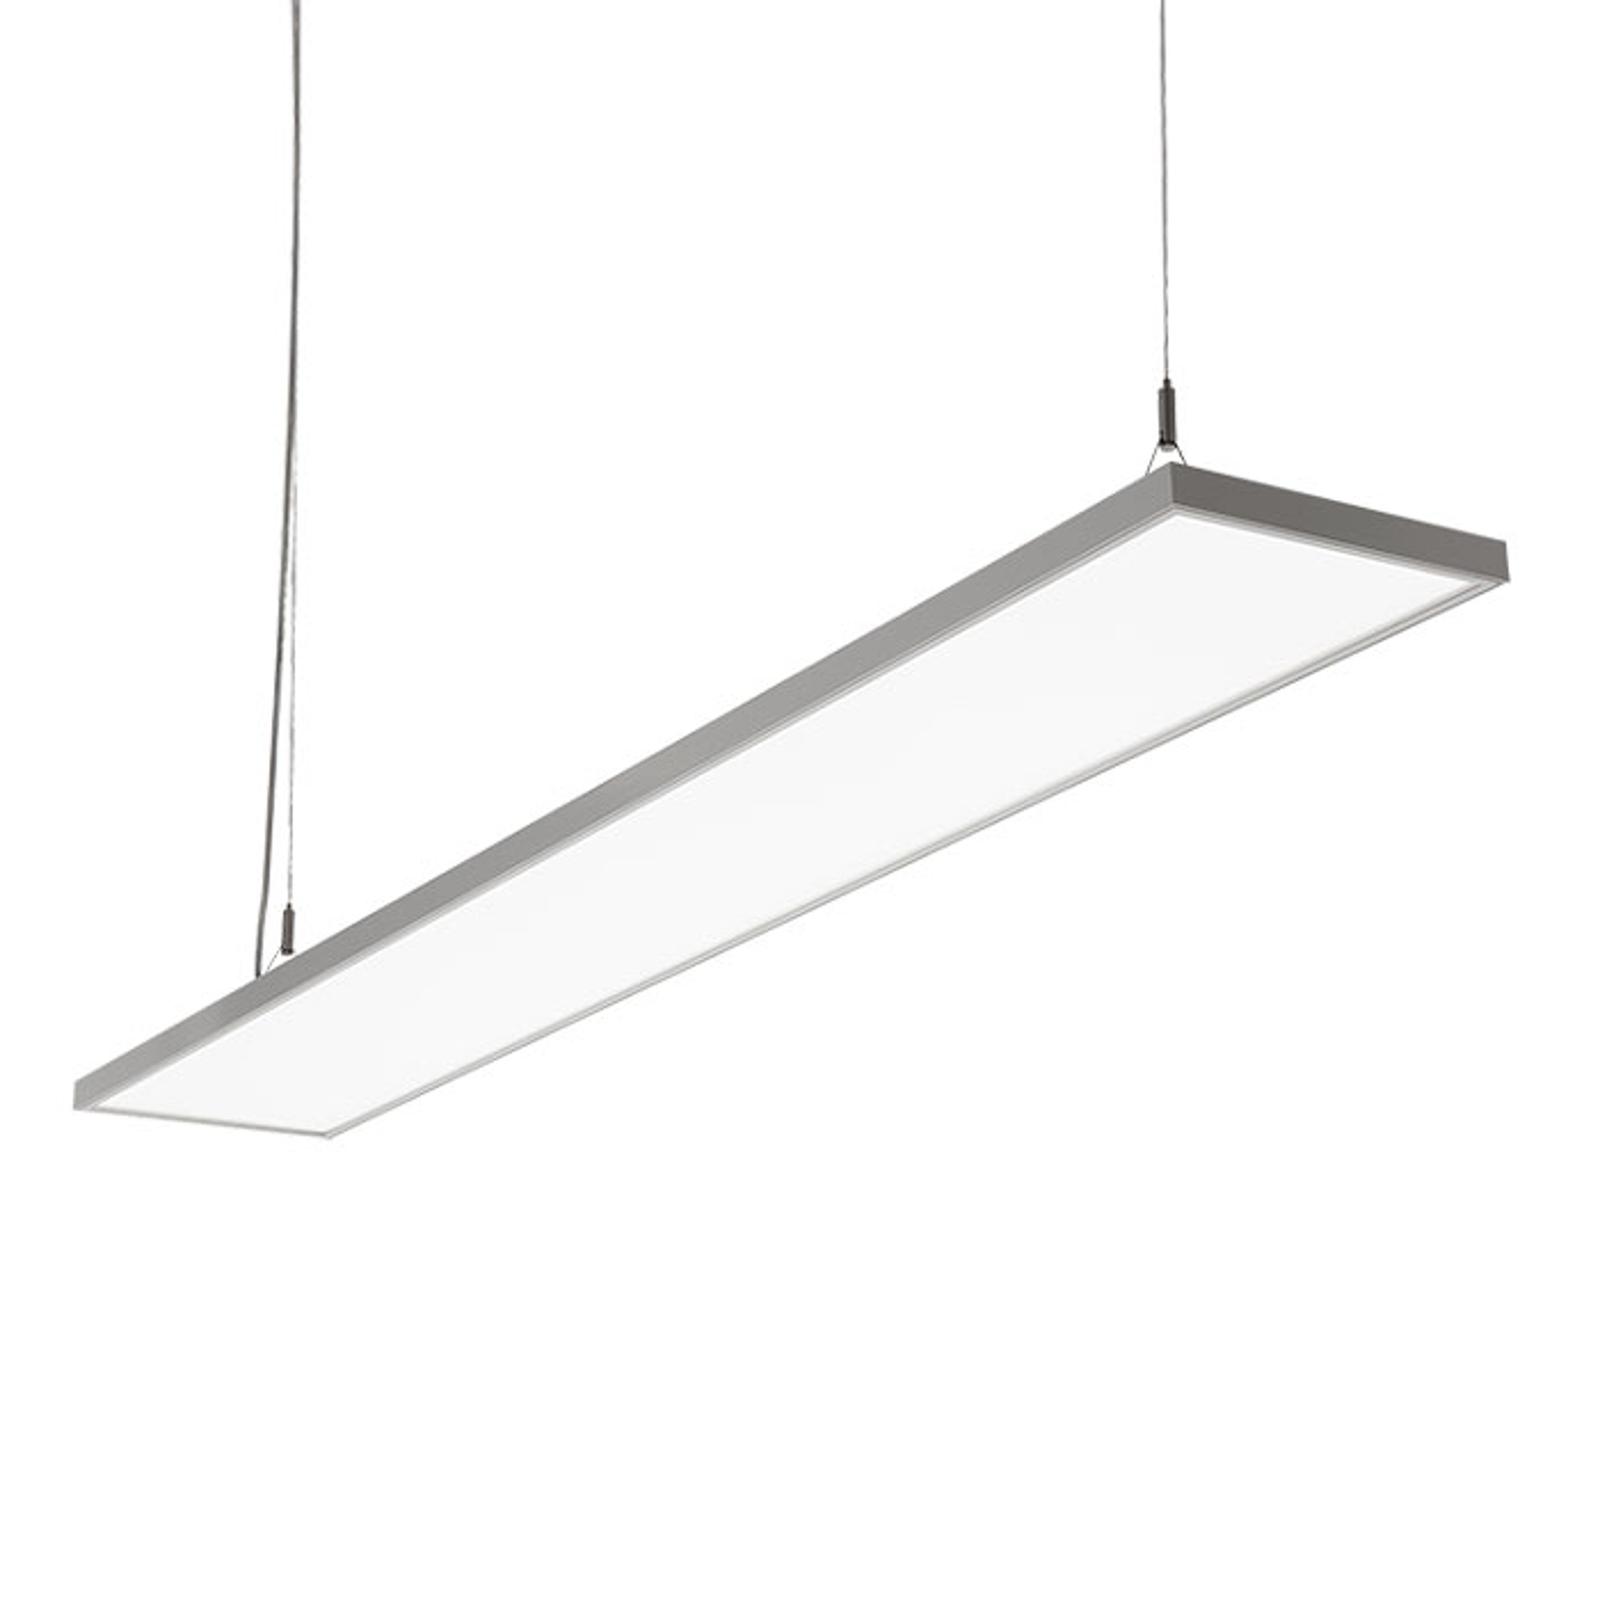 LED-Hängeleuchte C95-P, silbergrau, 149,4 cm